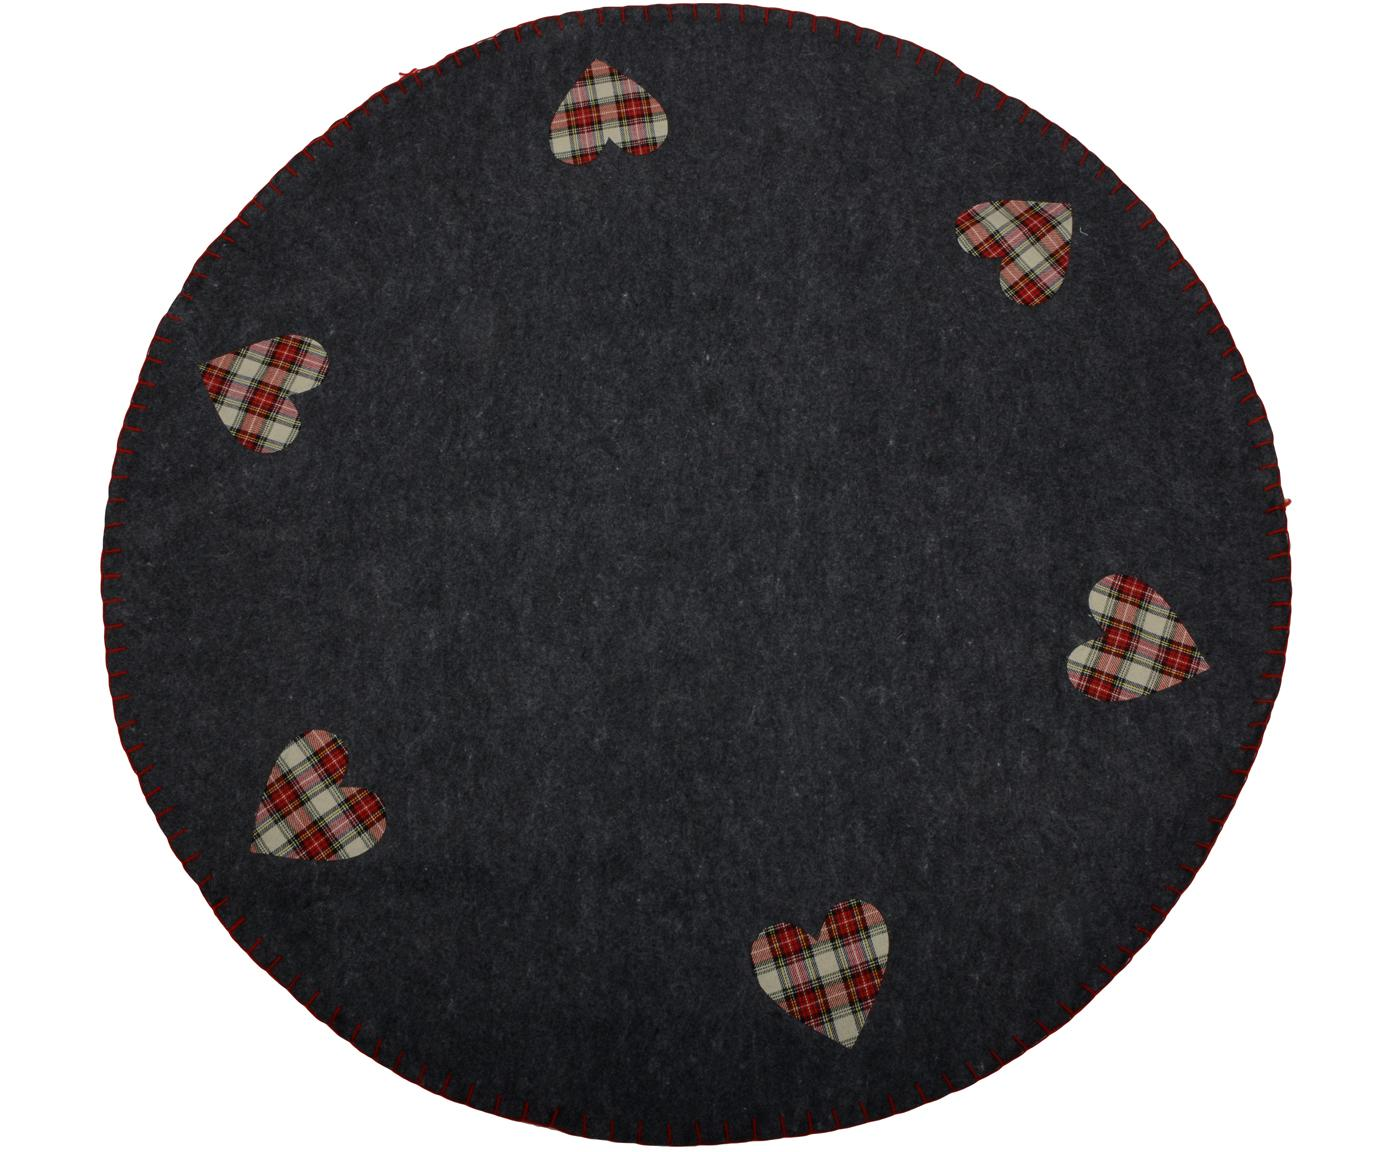 Weihnachtsbaumdecke Heart, Filz, Dunkelgrau, Beige, Rot, Ø 100 cm